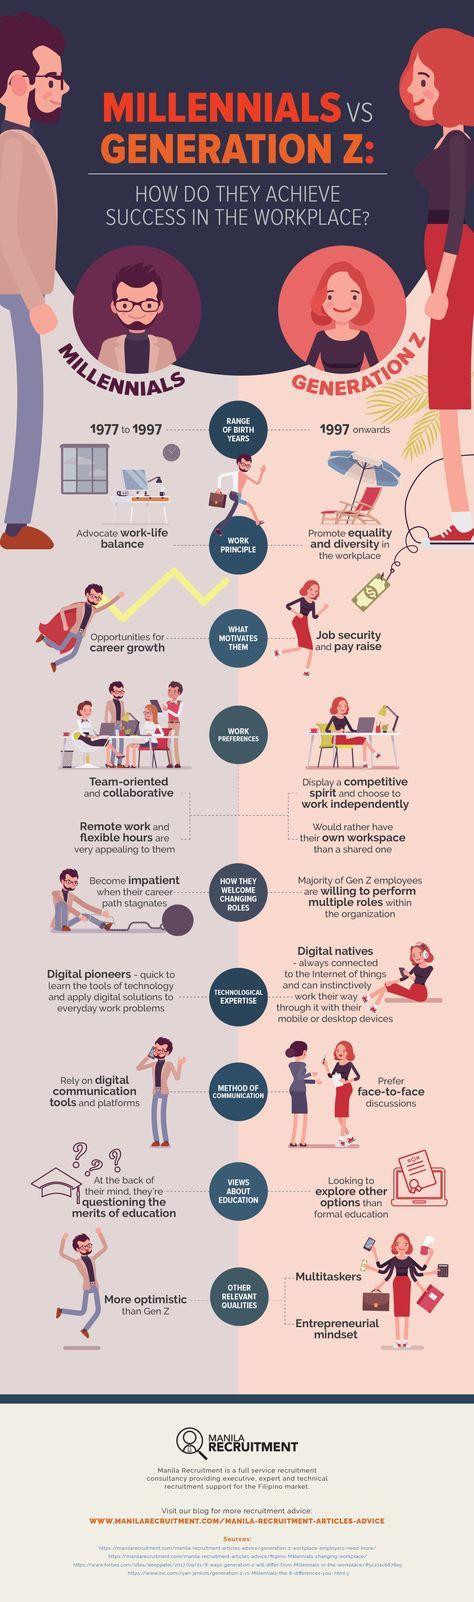 You Ve Probably Heard Of Generation Zs Edgers Plurals Igen Gen 2020 Centennials And Post Millennials Generation Z Management Infographic Hr Infographic